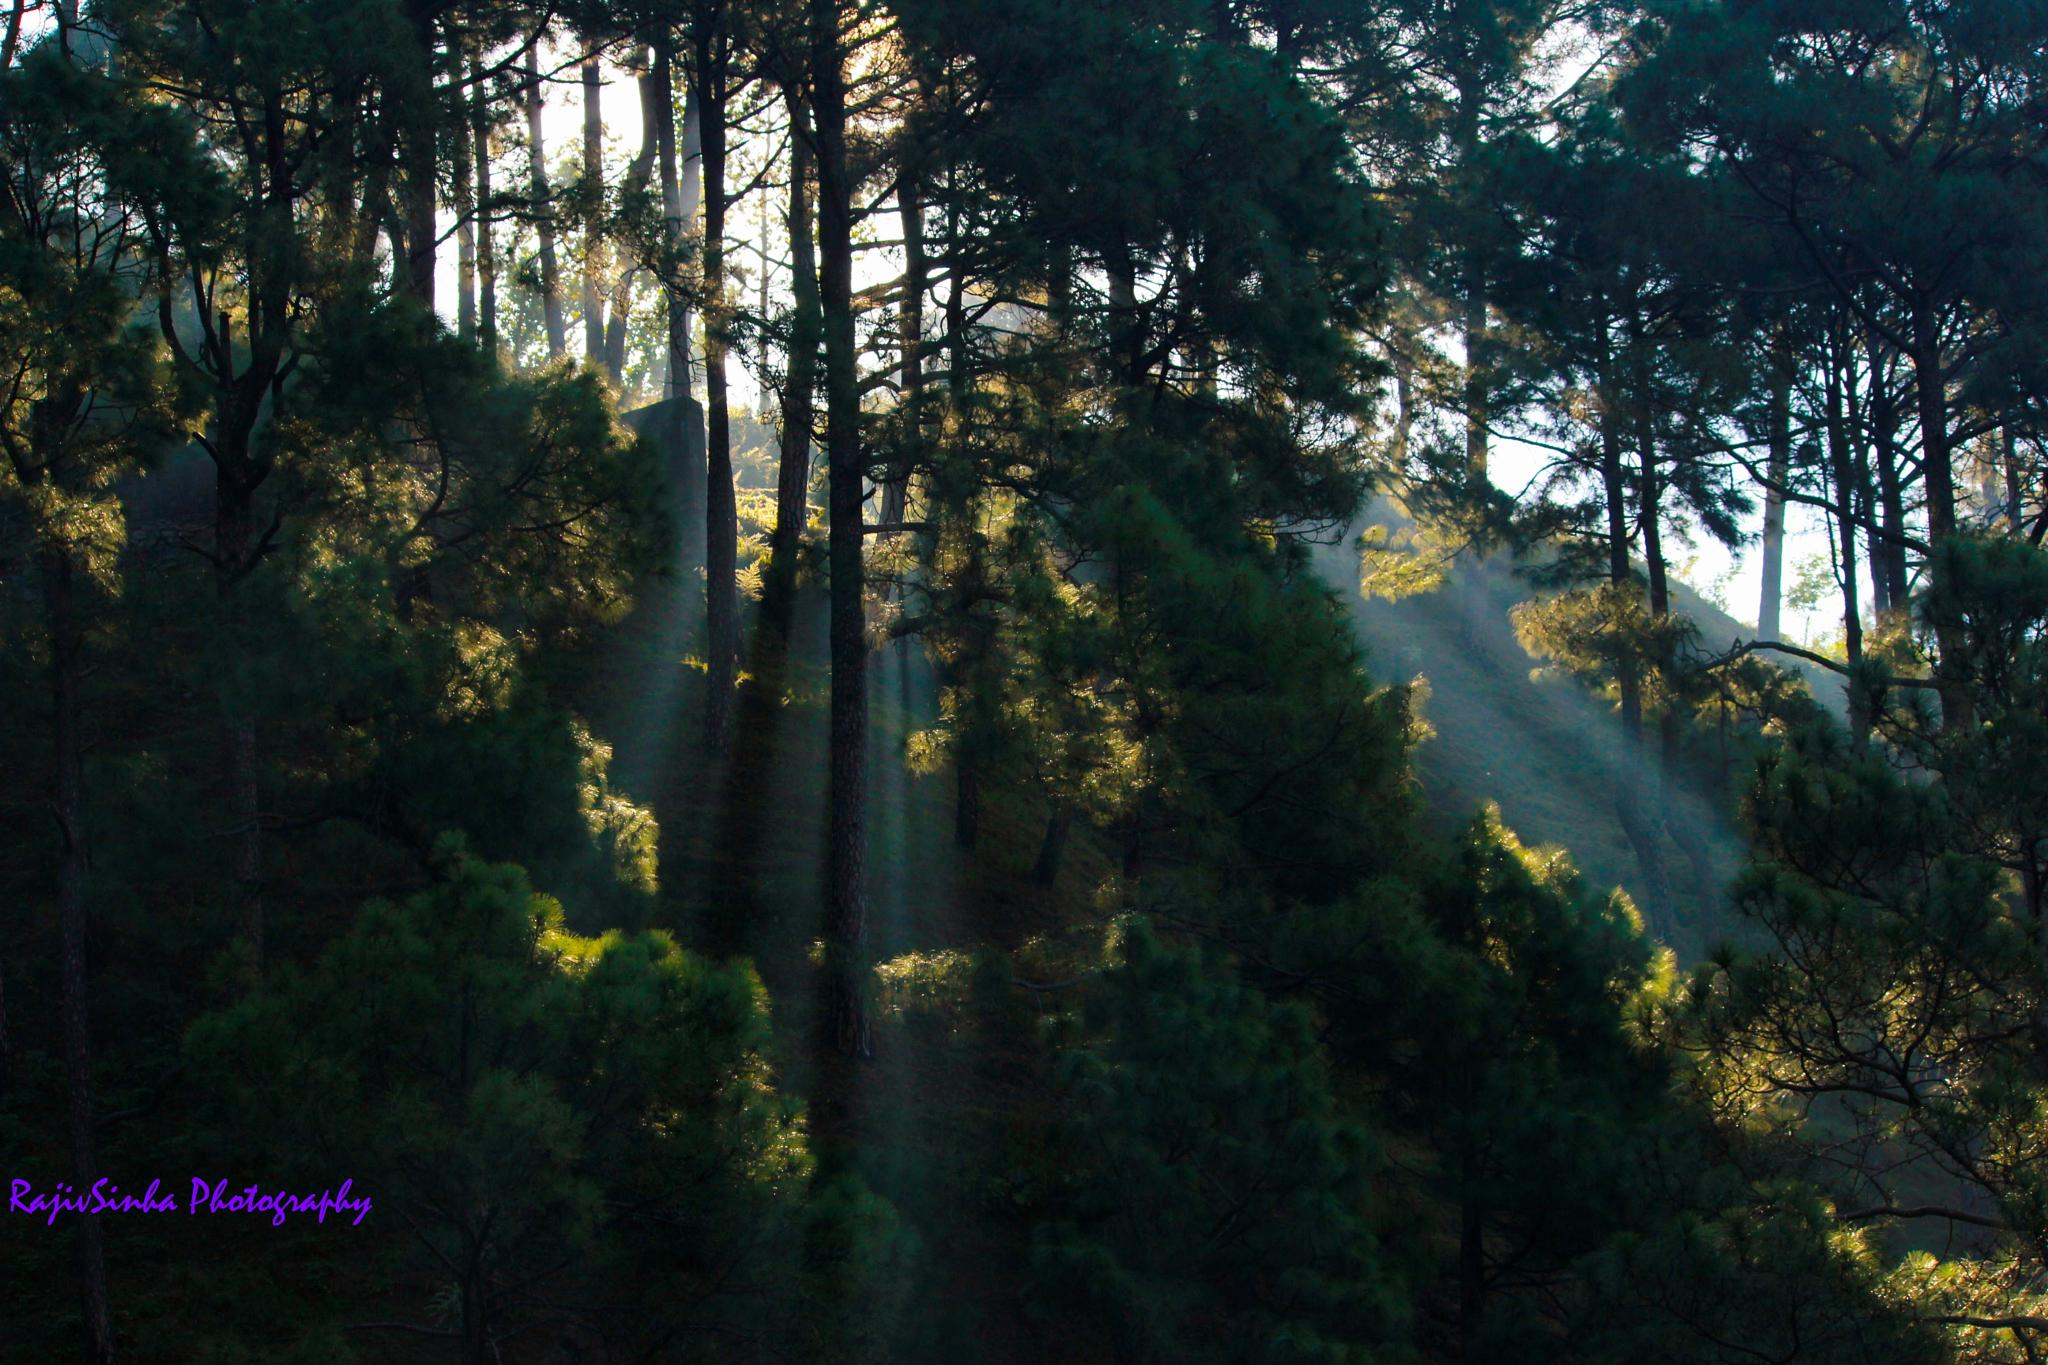 Ray of hope by Rajiv Sinha Photography